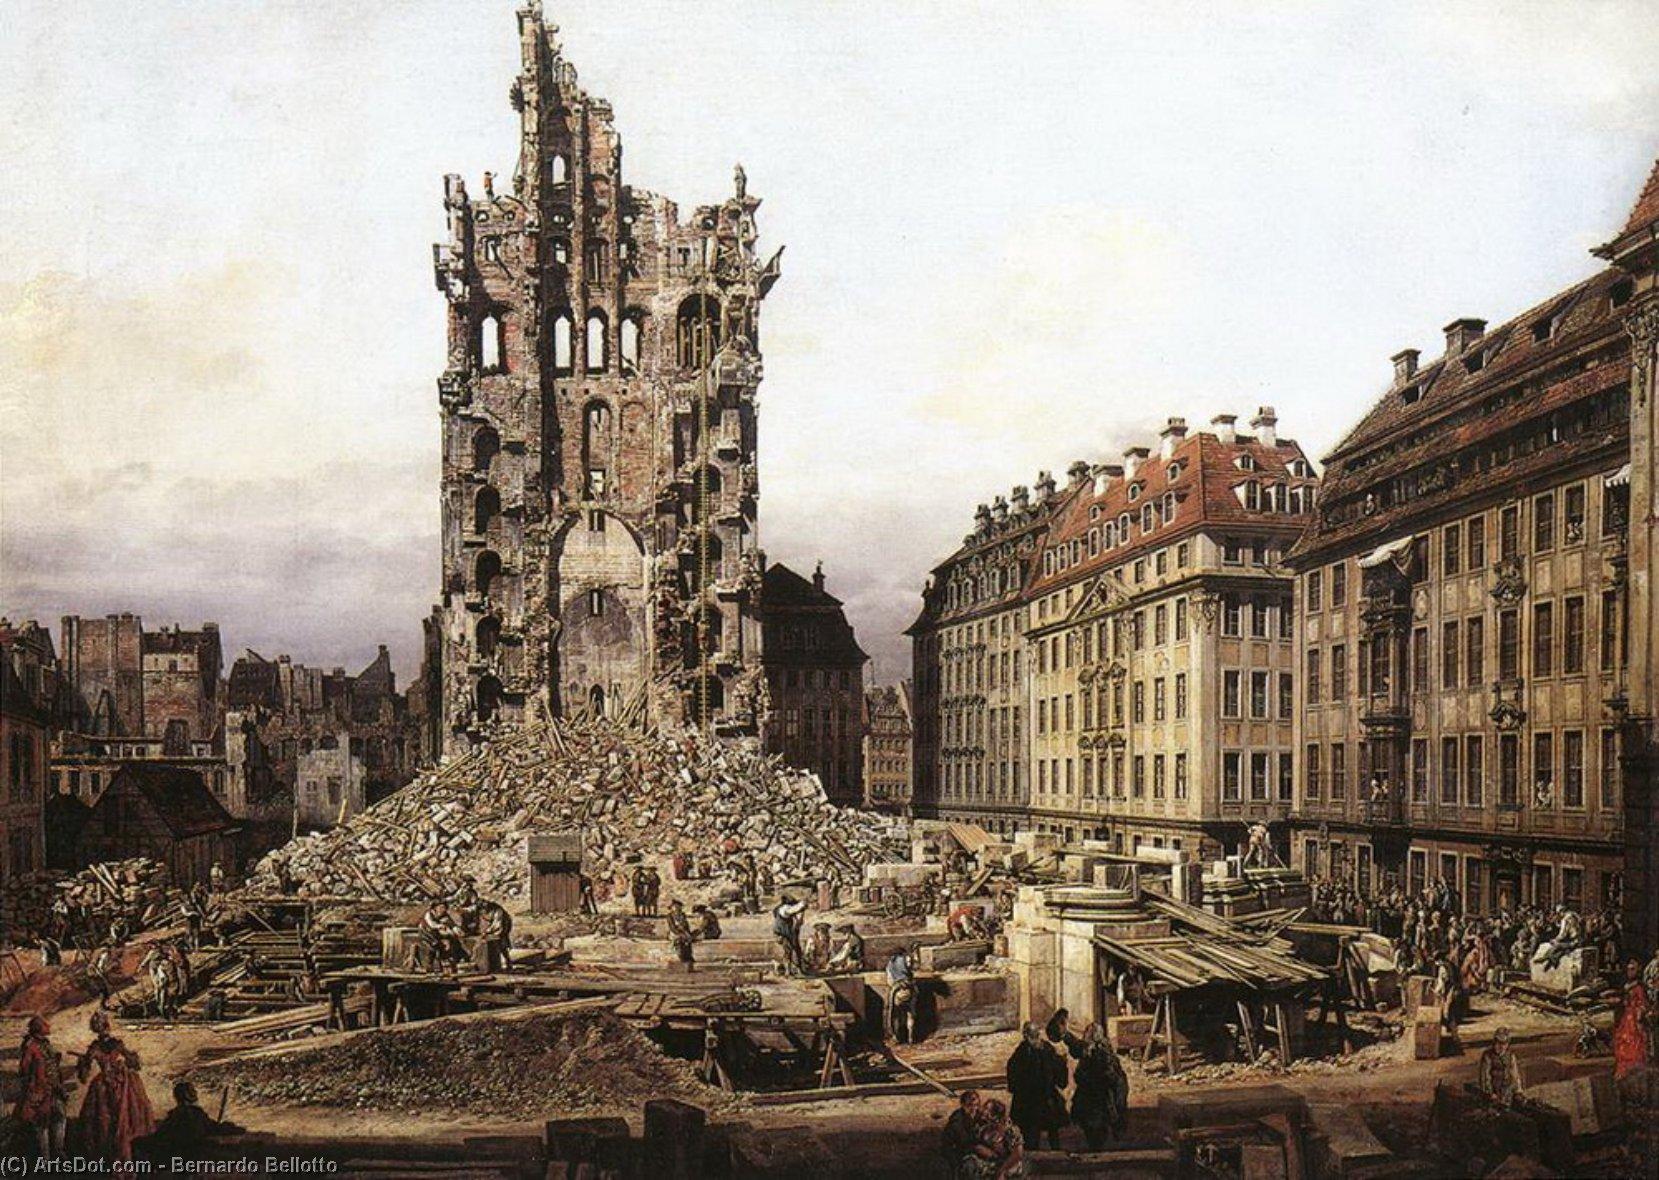 The Ruins of the Old Kreuzkirche in Dresden - Bernardo Bellotto